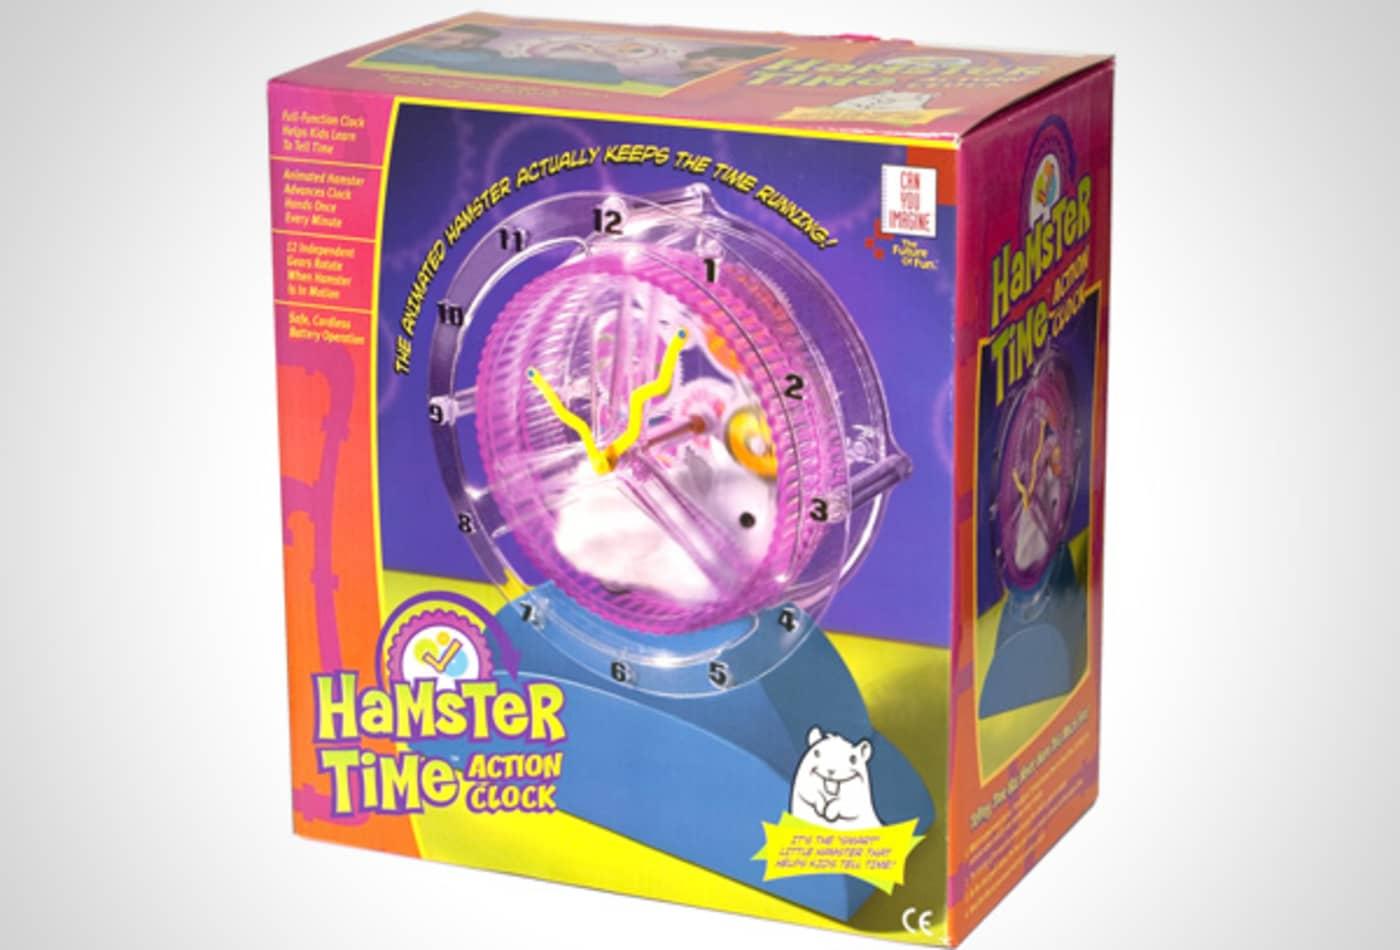 CNBC_strange_gadgets_hamsterclock.jpg